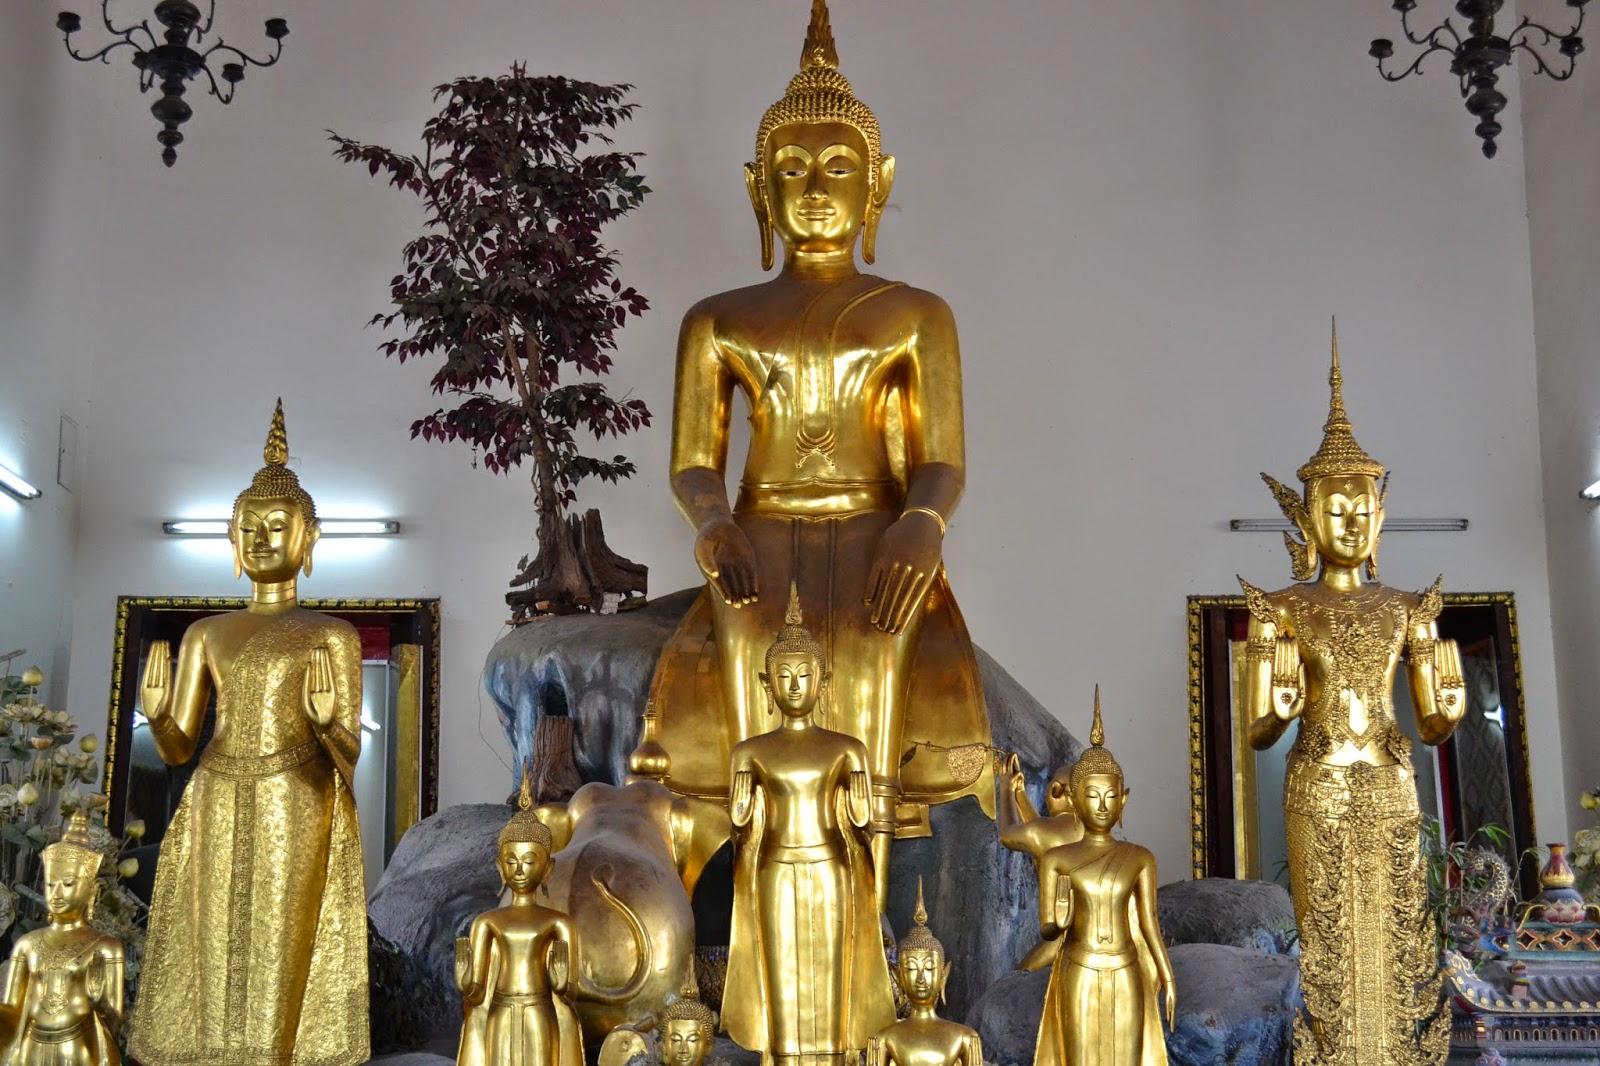 bangkok, voyage, parc, nénuphar, quartier indien